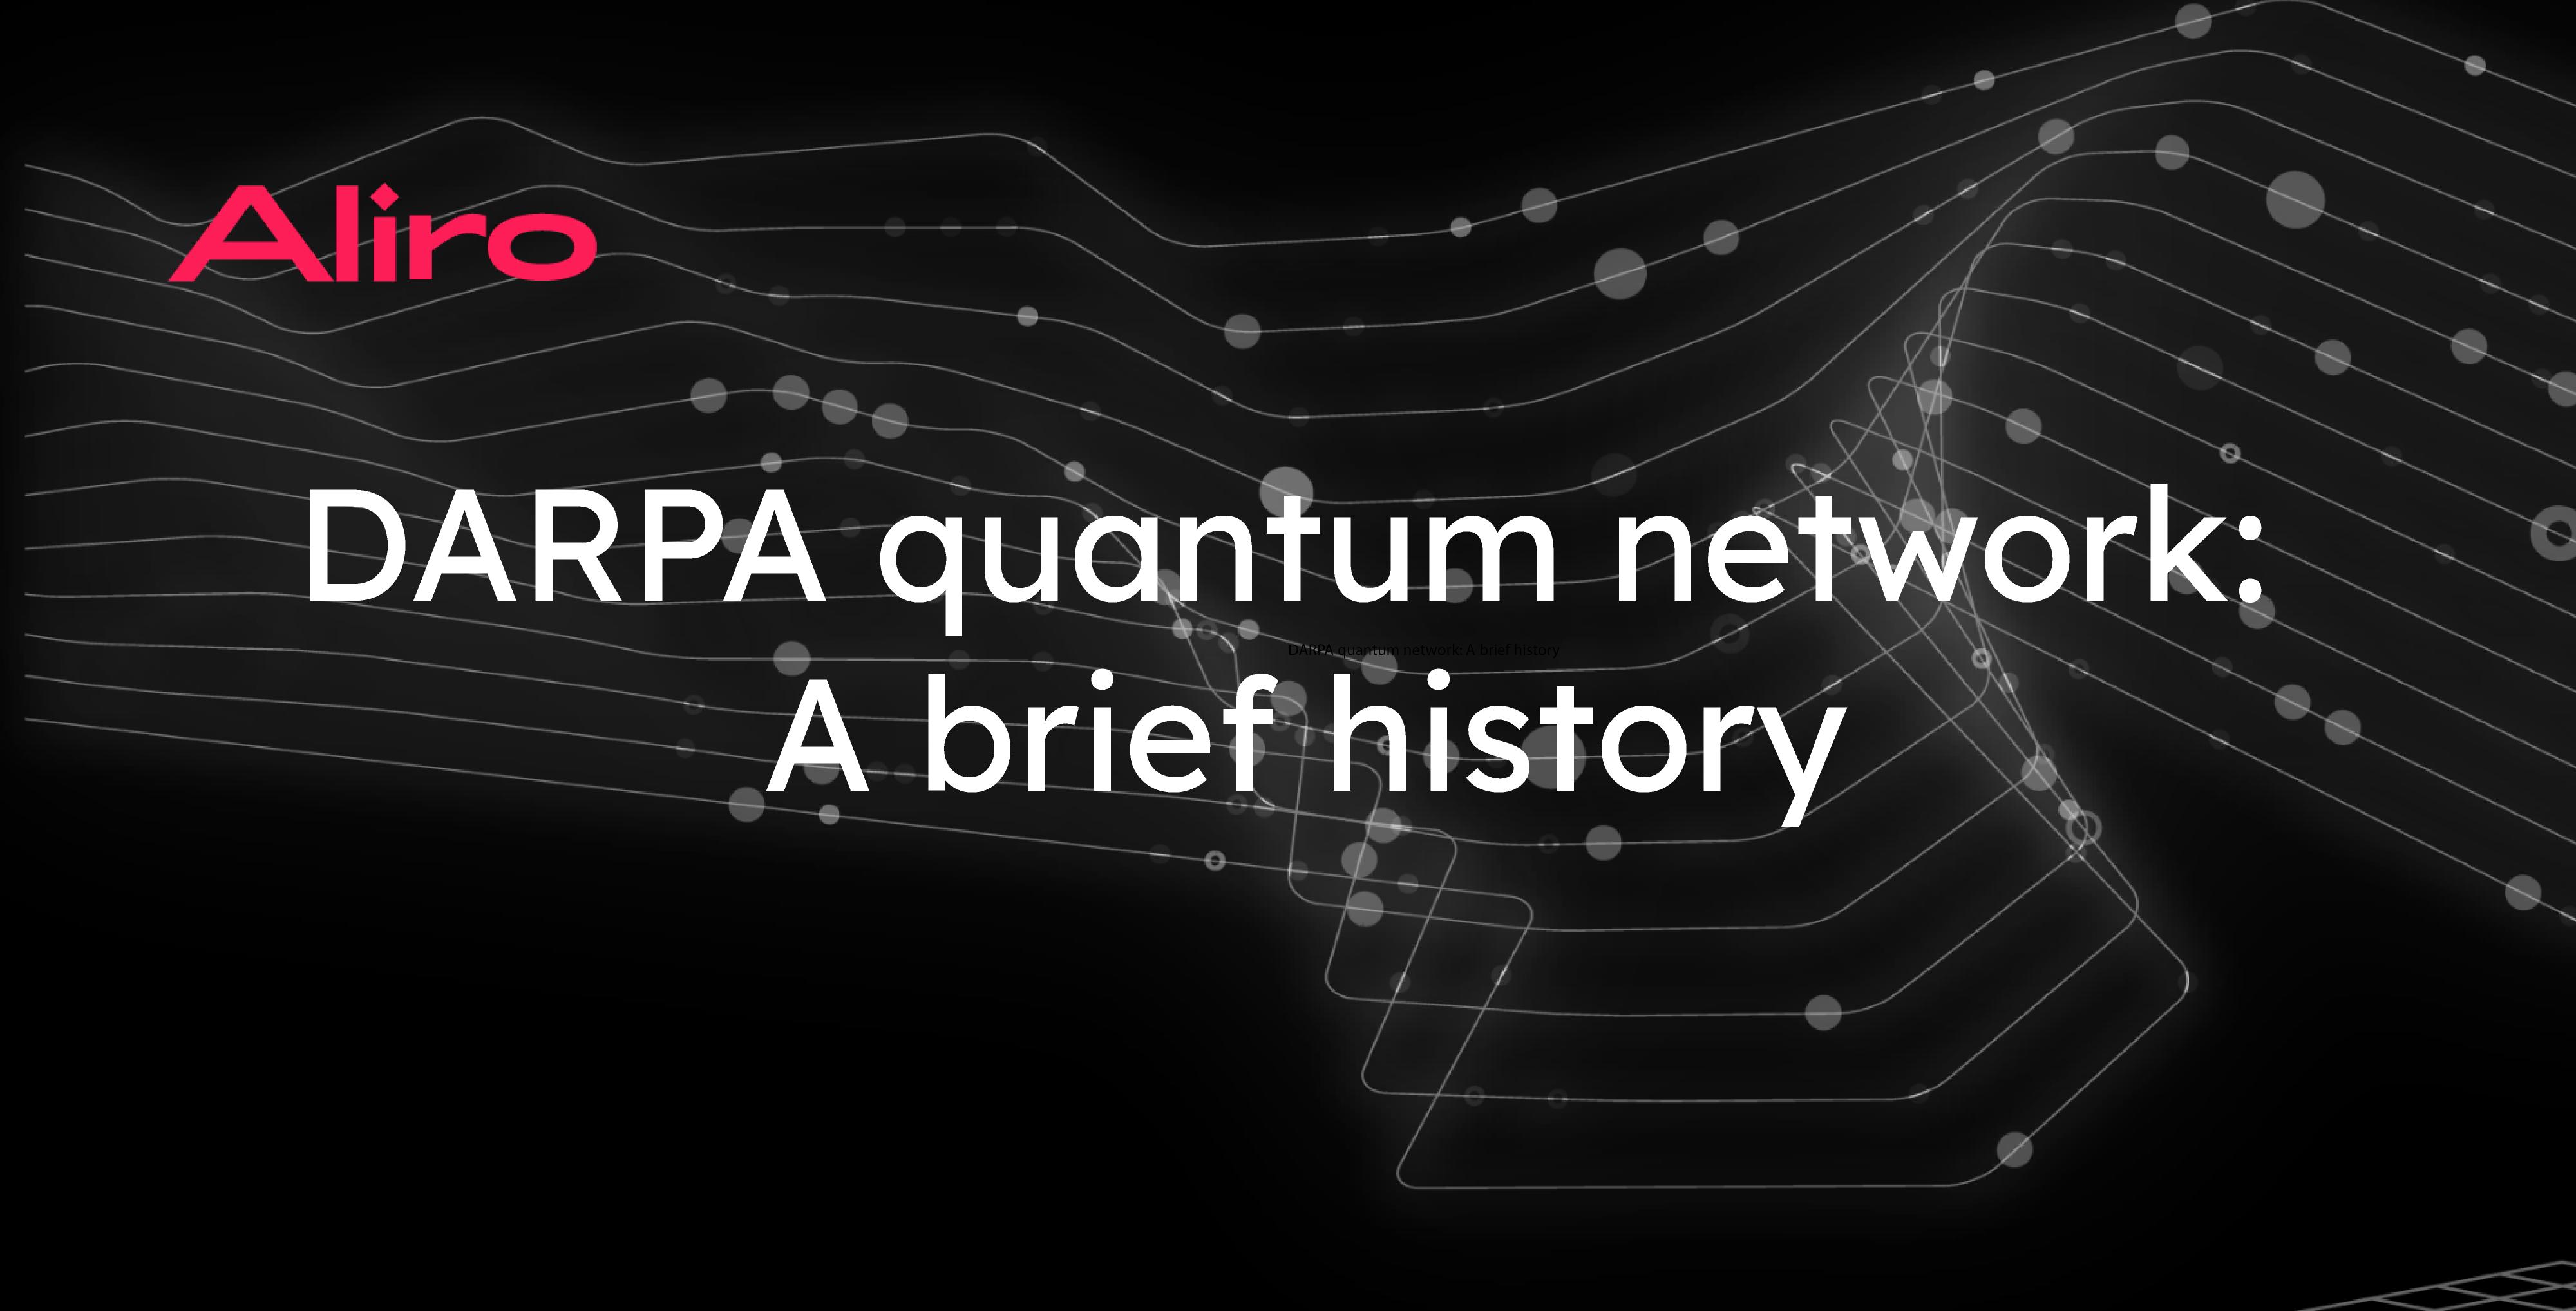 DARPA quantum network: A brief history